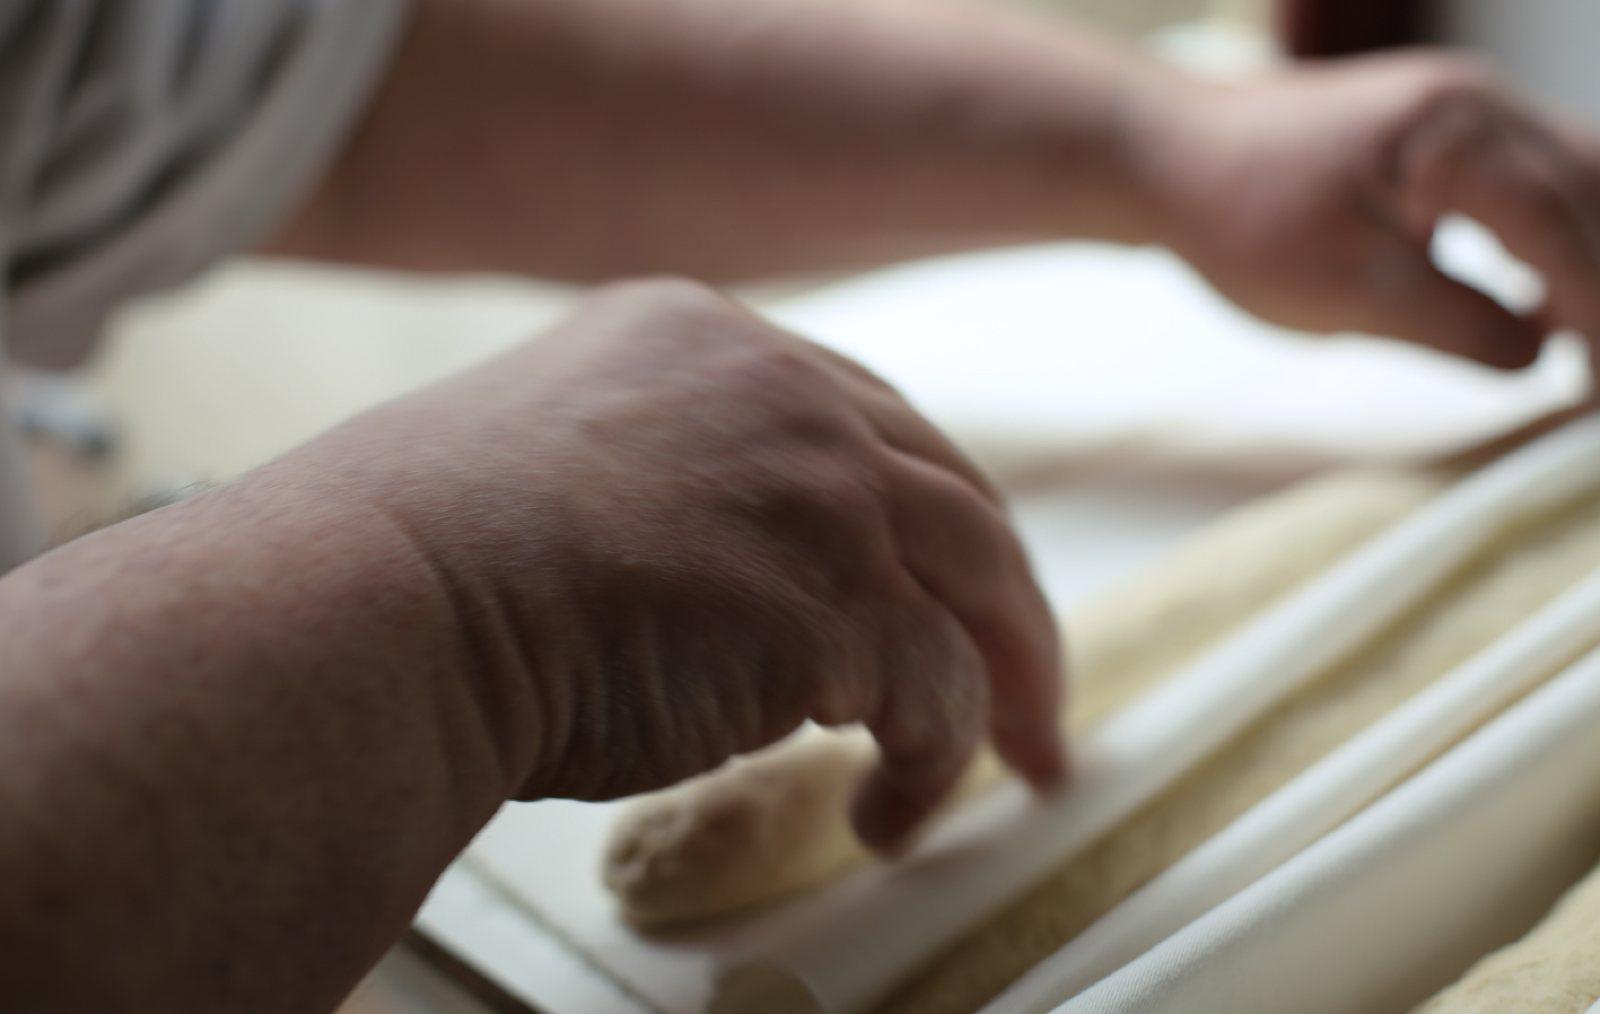 En Sergi elabora el pa durant la nit.